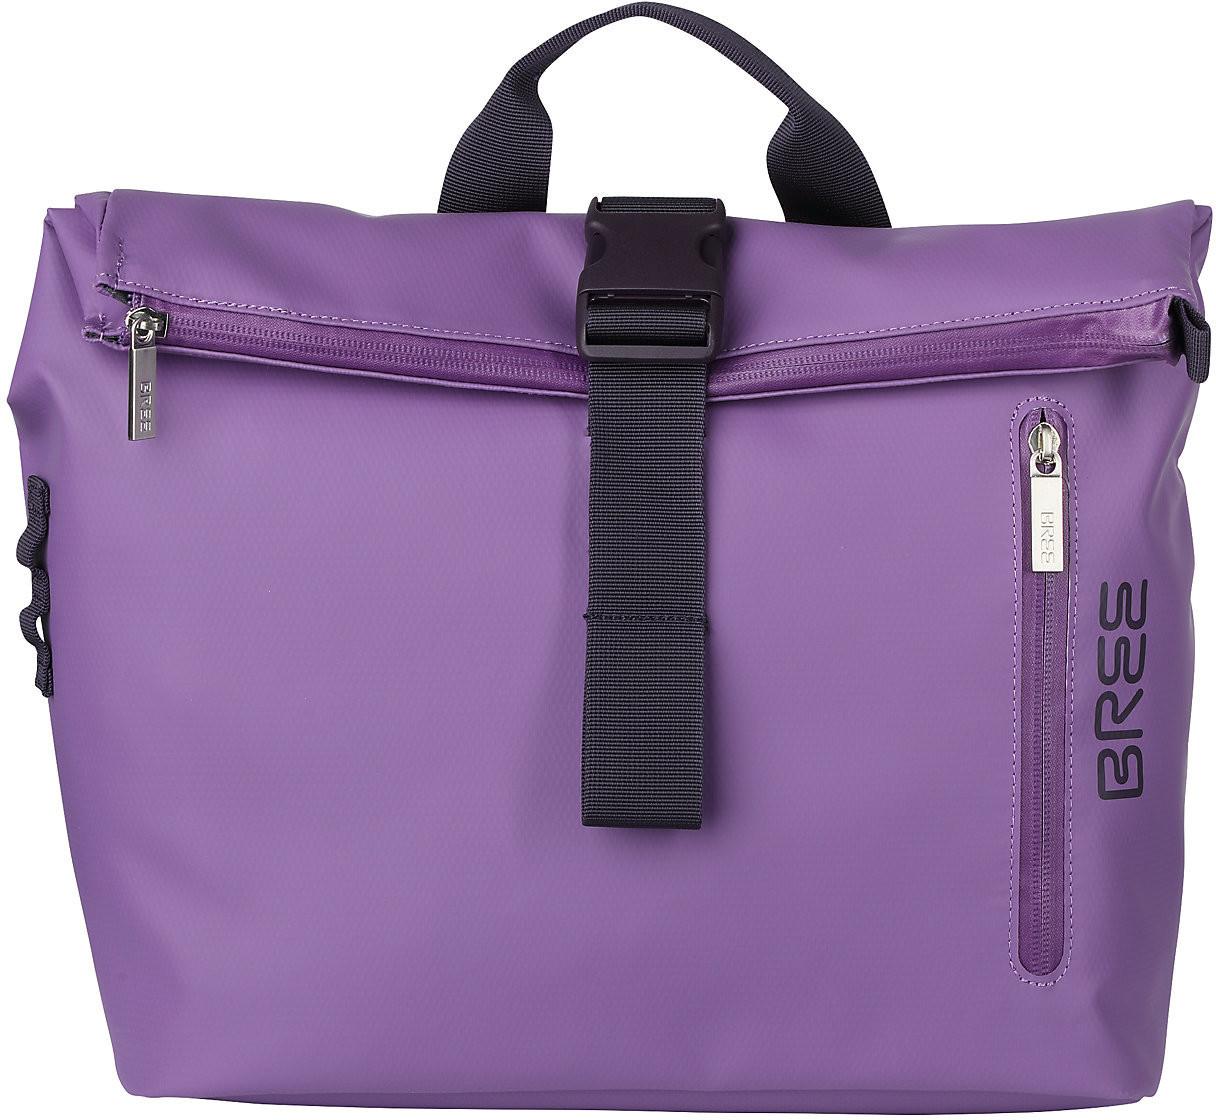 Bree Punch 722 purple